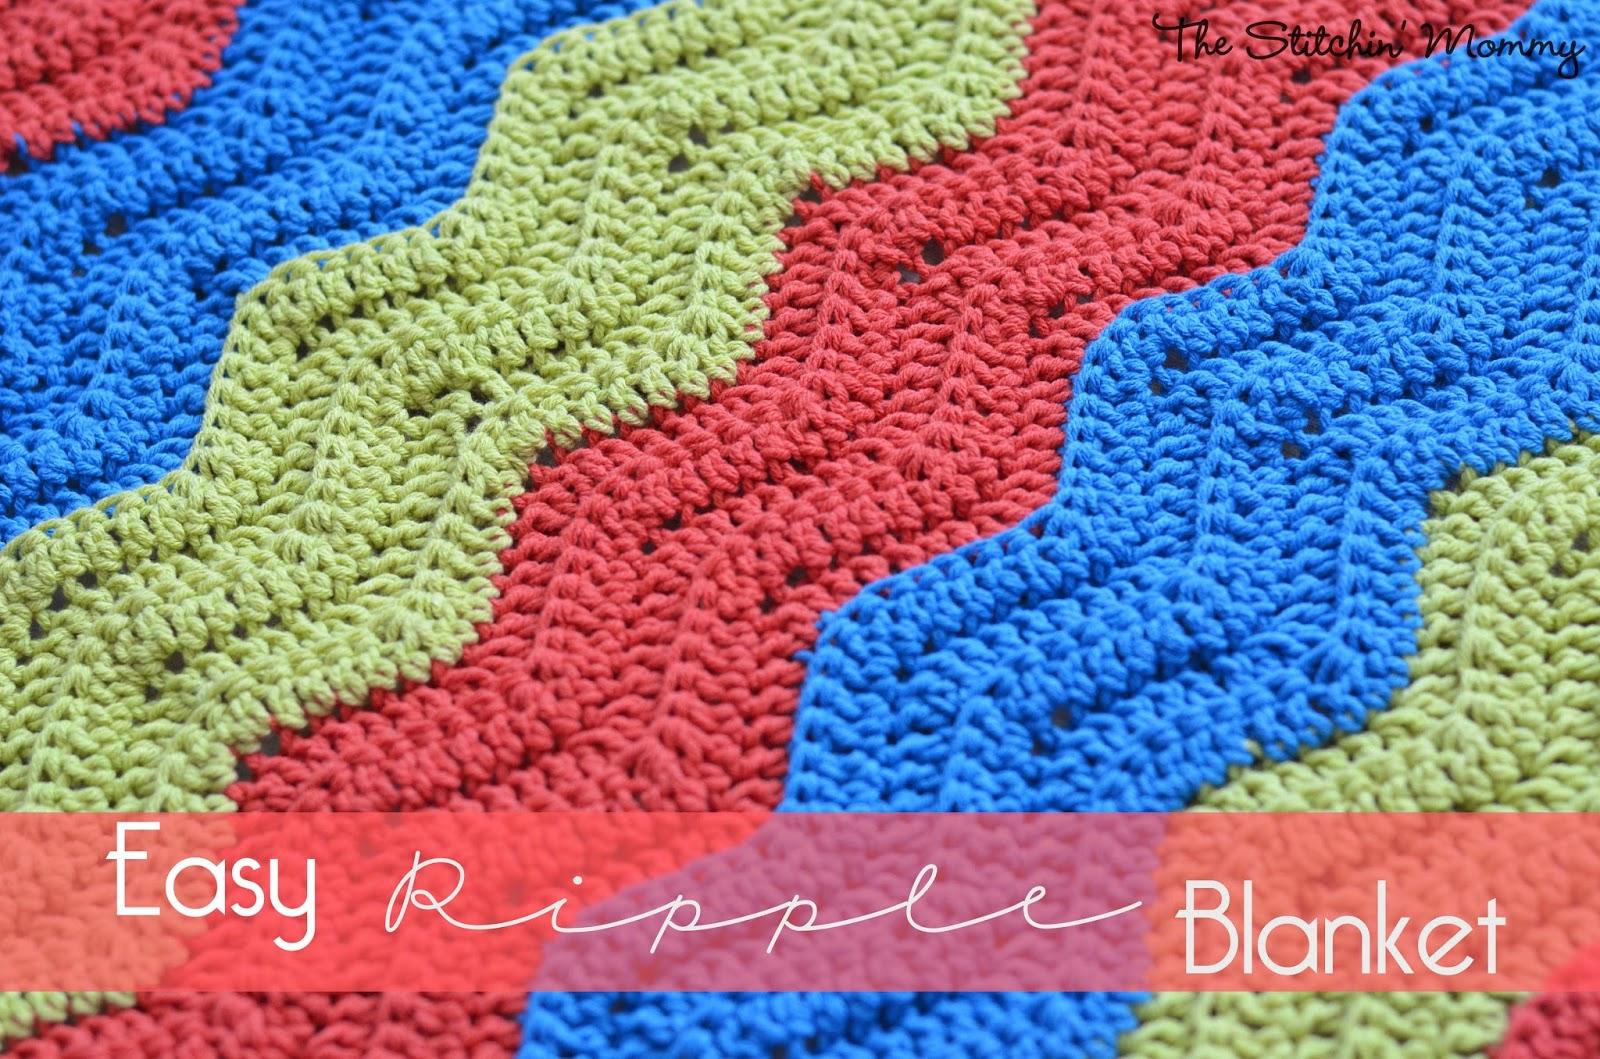 Easy Crochet Ripple Blanket www.thestitchinmommy.com